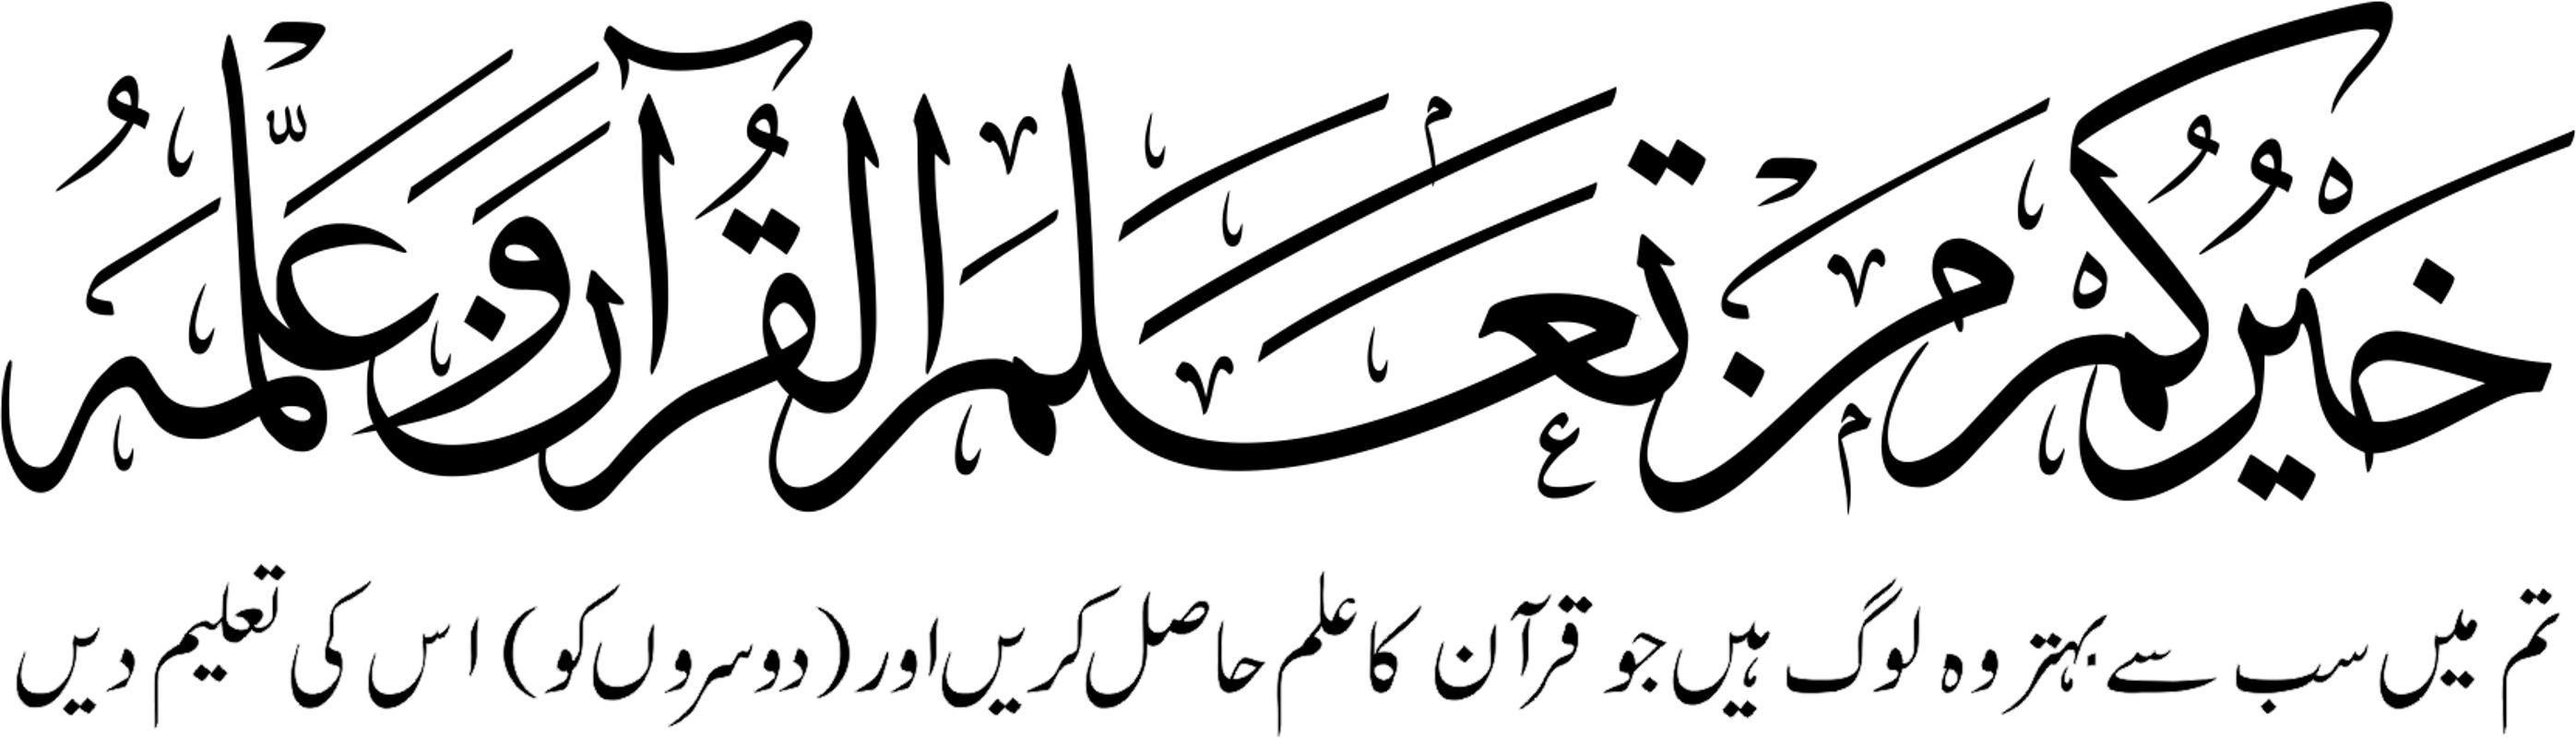 Khair-o-kum ( Quran ) Islamic Calligraphy Free CDR Vectors Art